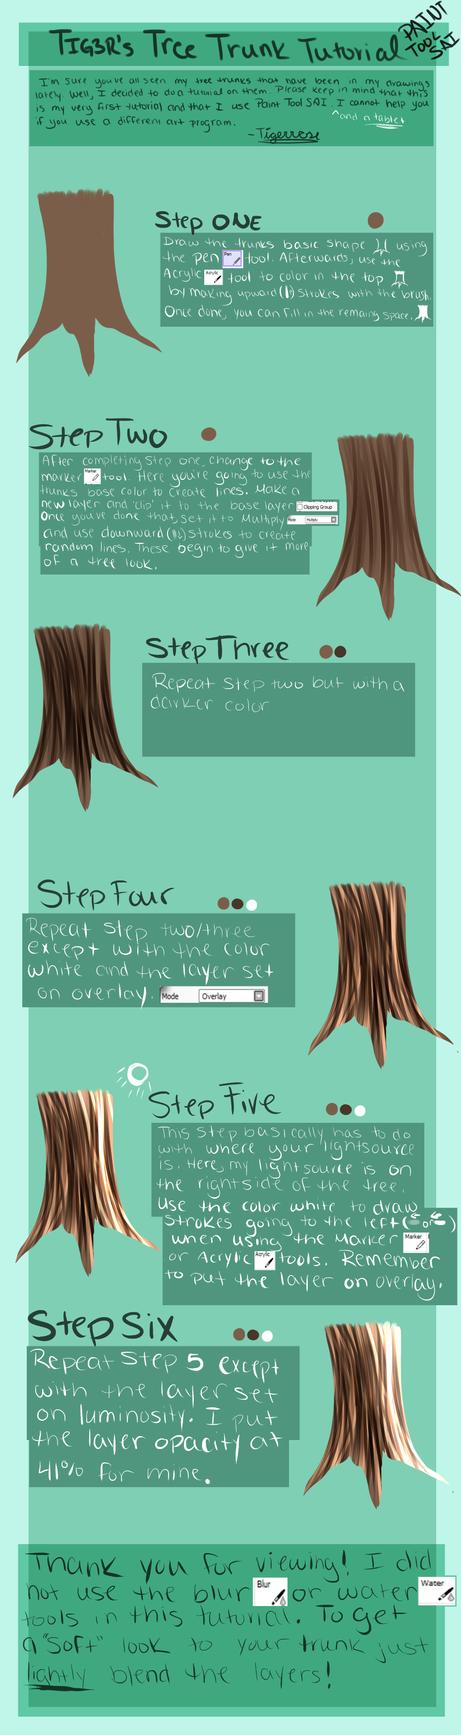 Tree Trunk Tutorial by TIG3RR0S3